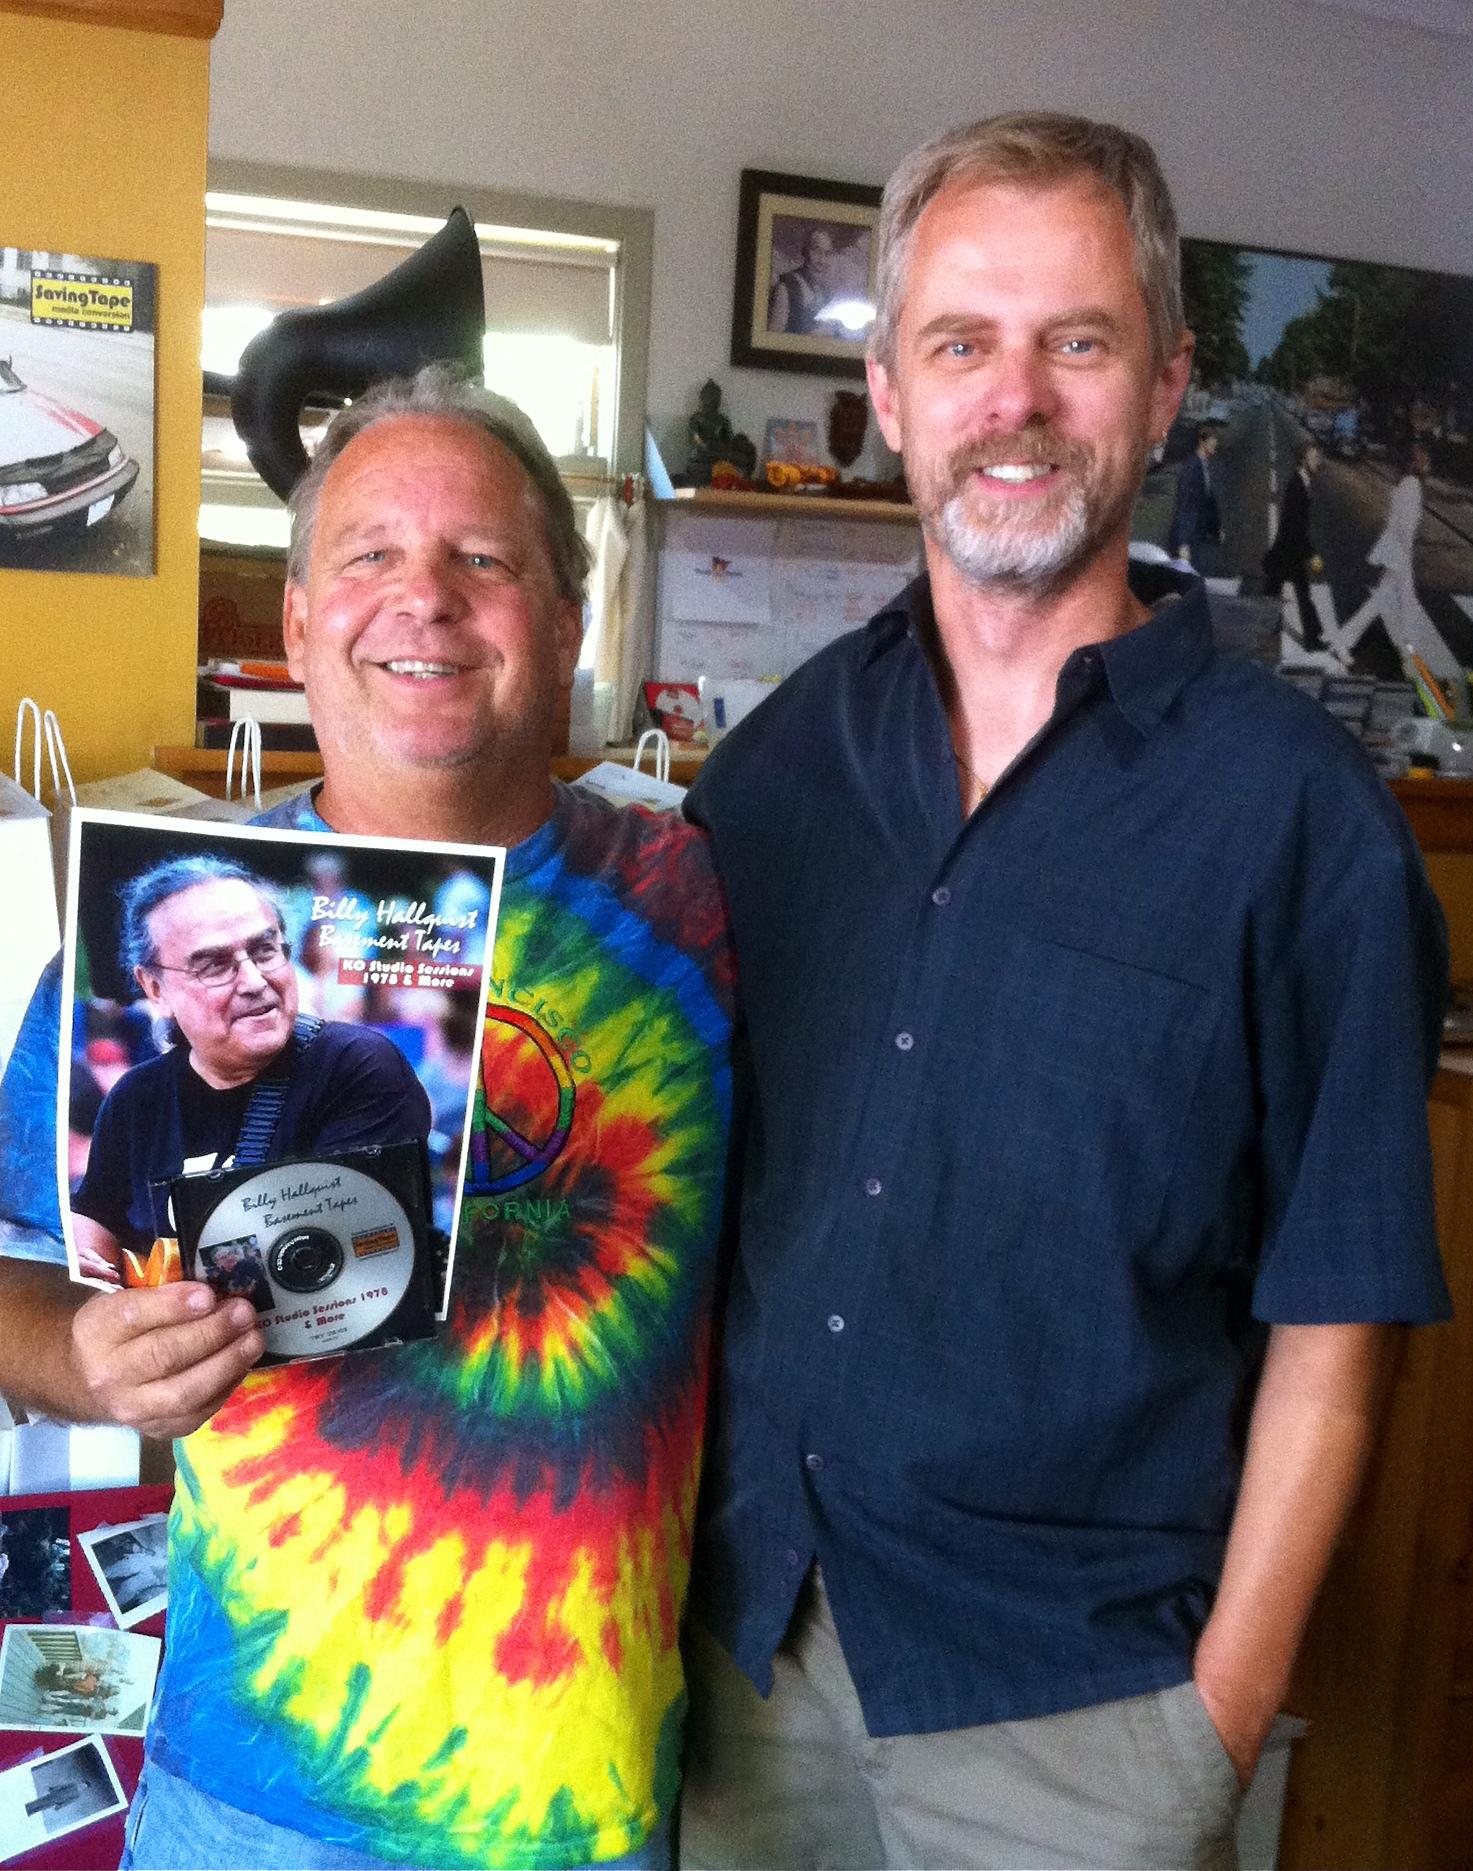 Billy Hallquist Basement Tapes - Mark Lapakko and Thor Anderson / Saving Tape / Minneapolis, Minnesota /July 29th, 2016